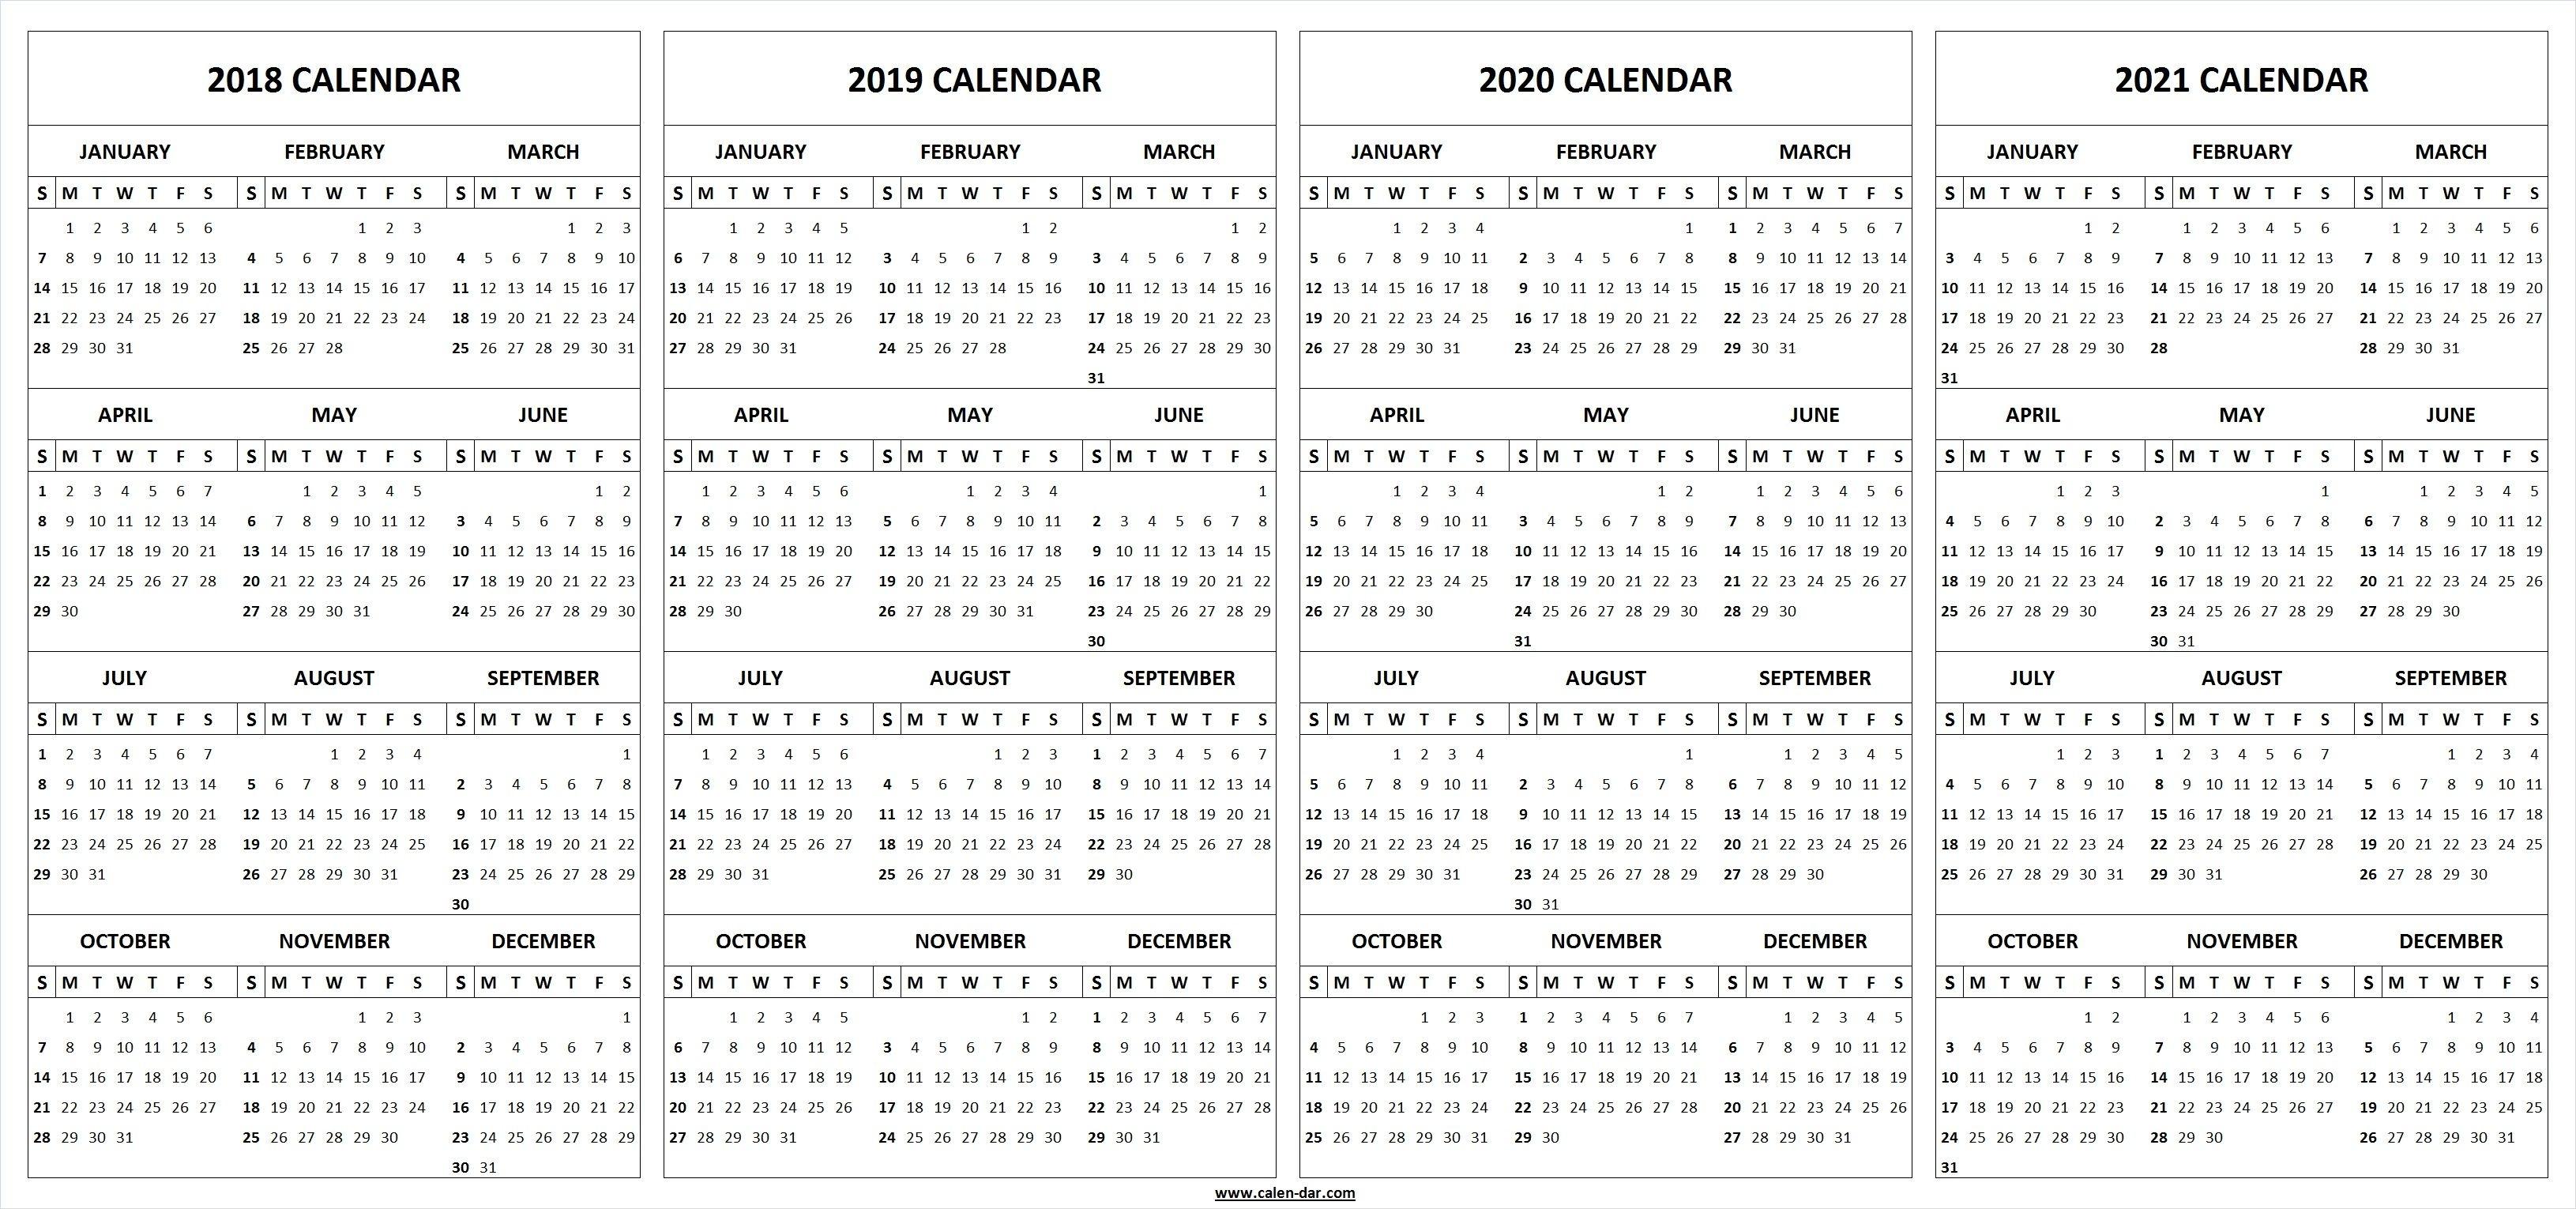 4 Four Year 2018 2019 2020 2021 Calendar Printable Template for 3 Year Calendar Printable 2019 2020 2021